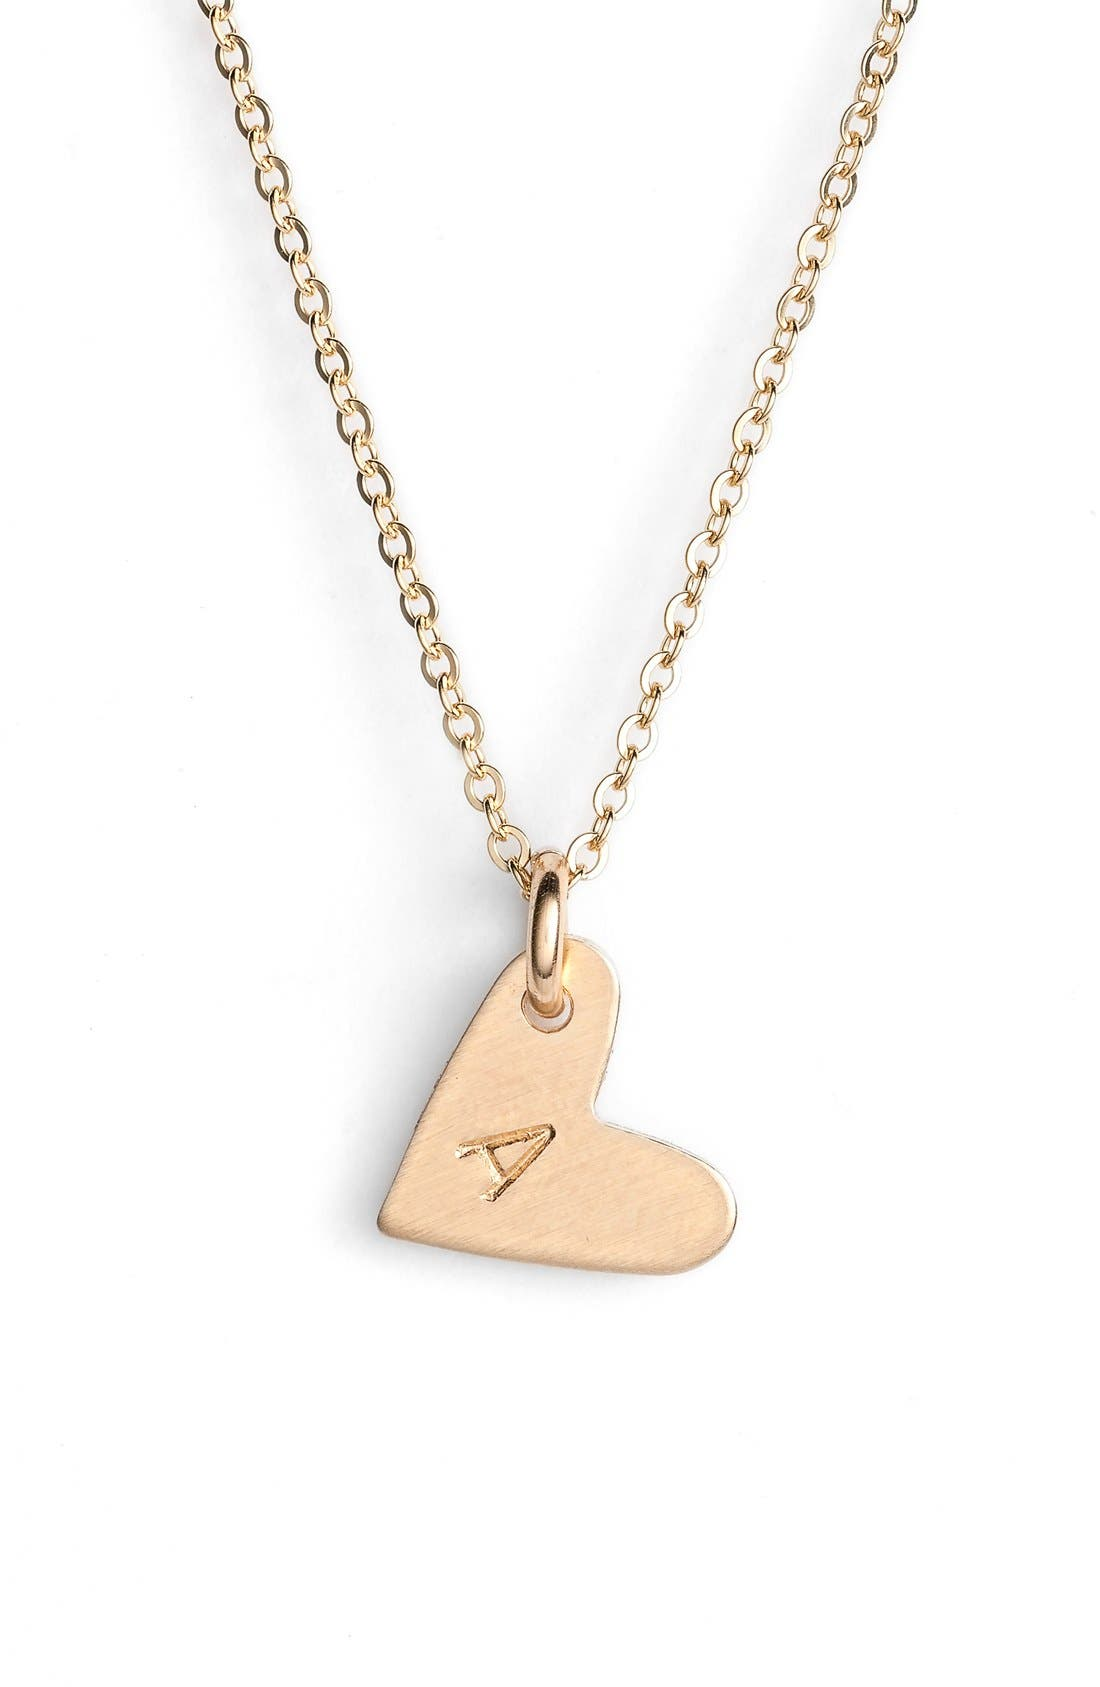 NASHELLE, 14k-Gold Fill Initial Mini Heart Pendant Necklace, Main thumbnail 1, color, GOLD/ A